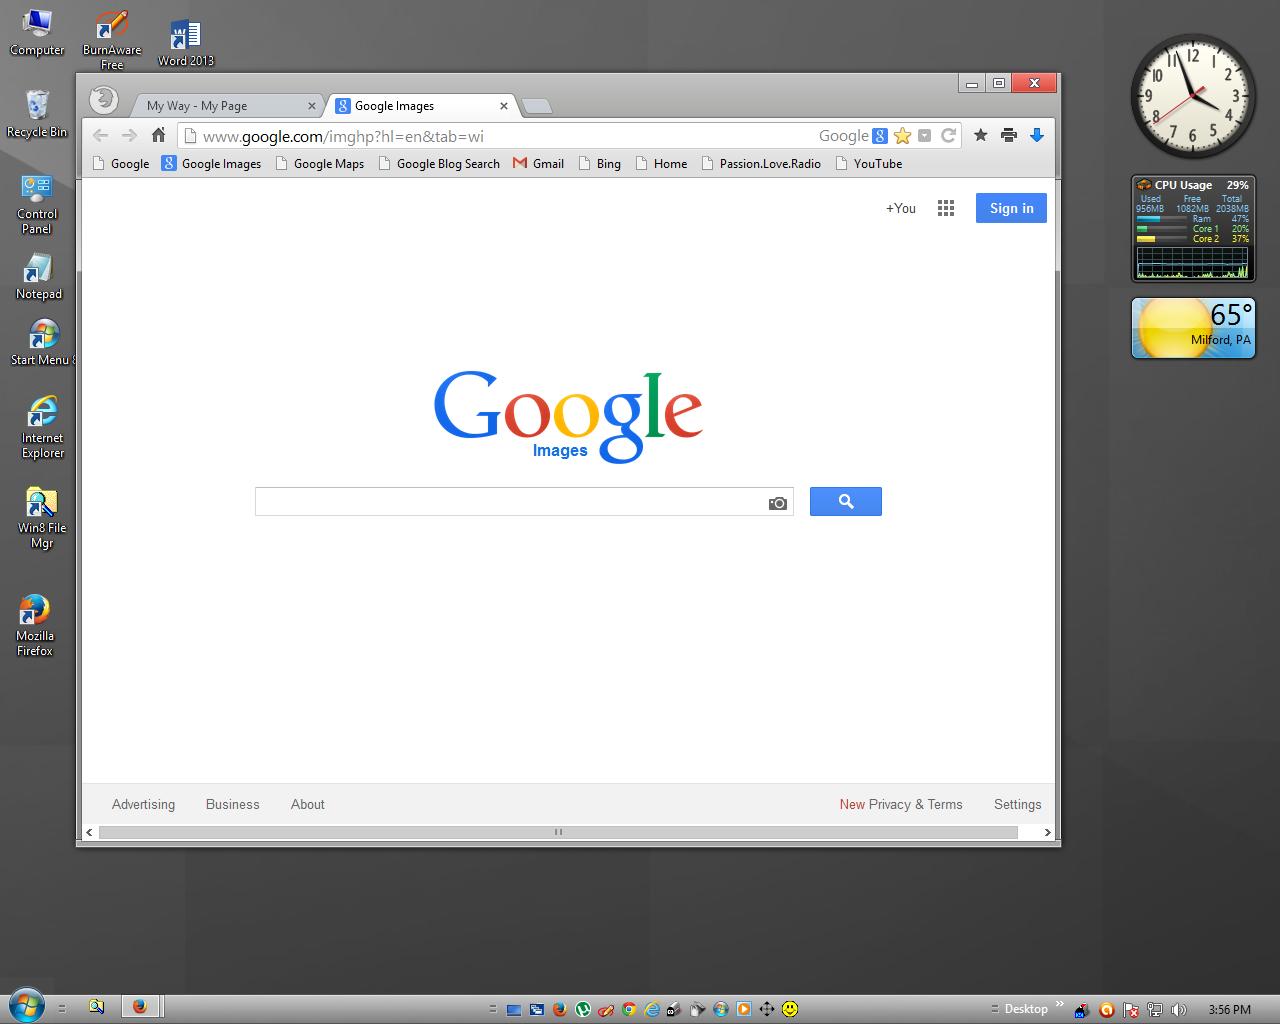 how to get m normal desktop on windows 10